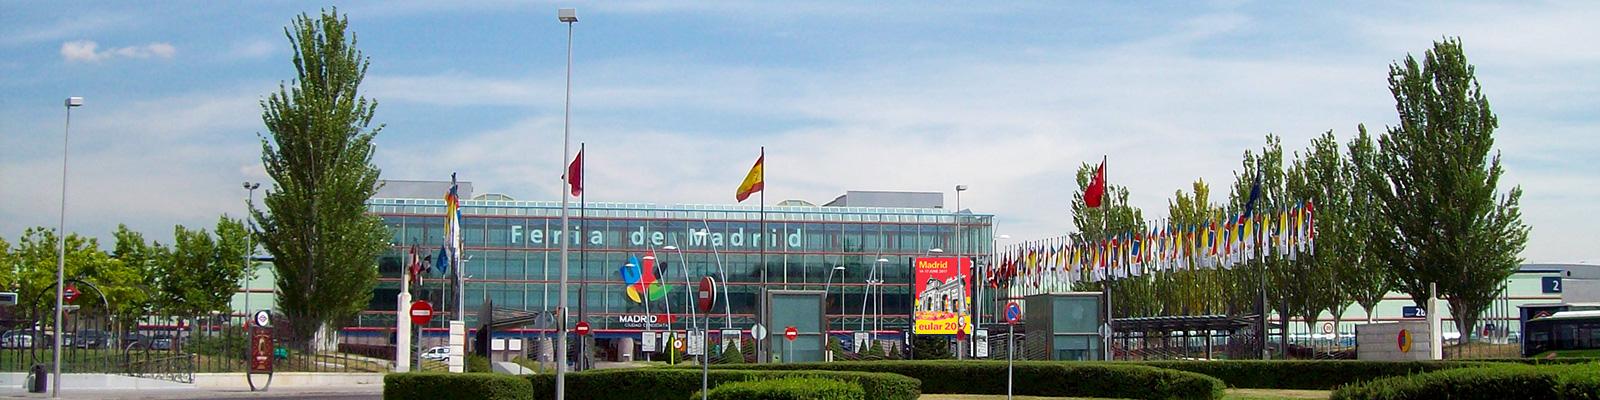 EULAR 2018 Amsterdam – Annual European Congress of Rheumatology